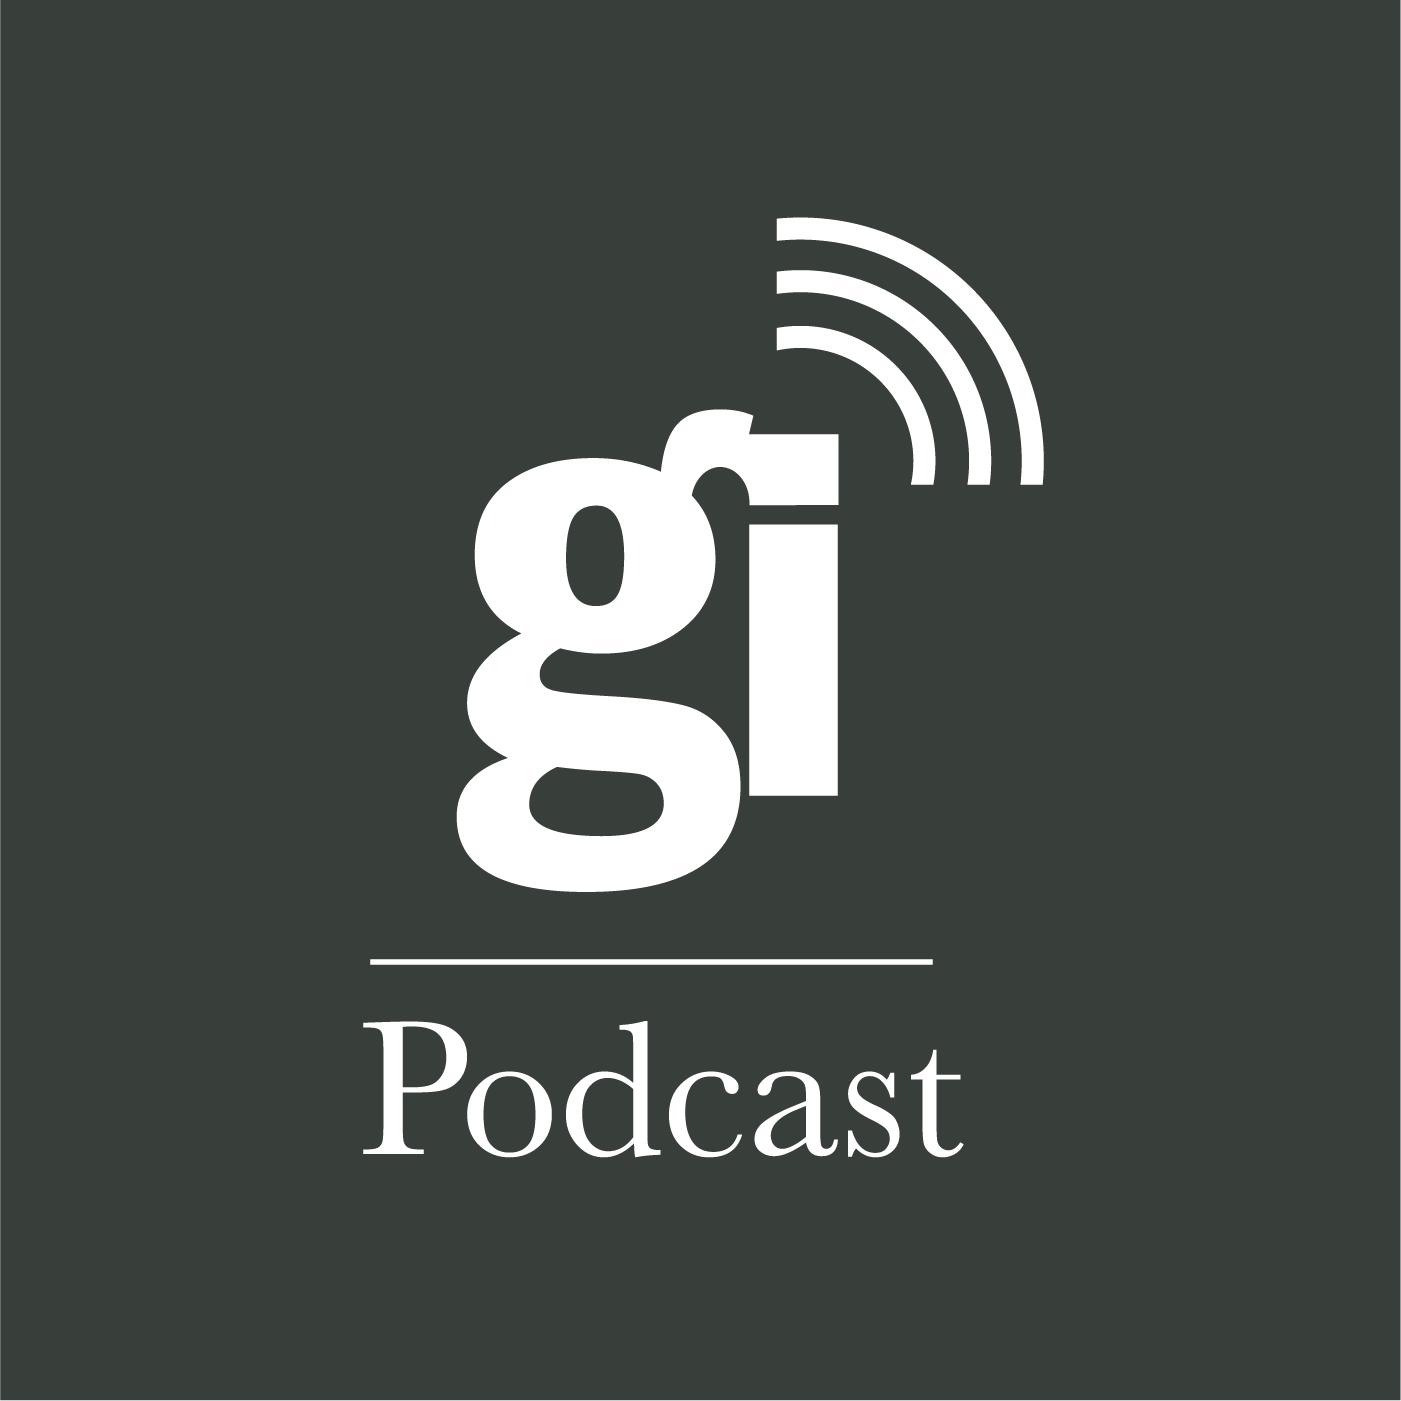 The GamesIndustry.biz Podcast show art